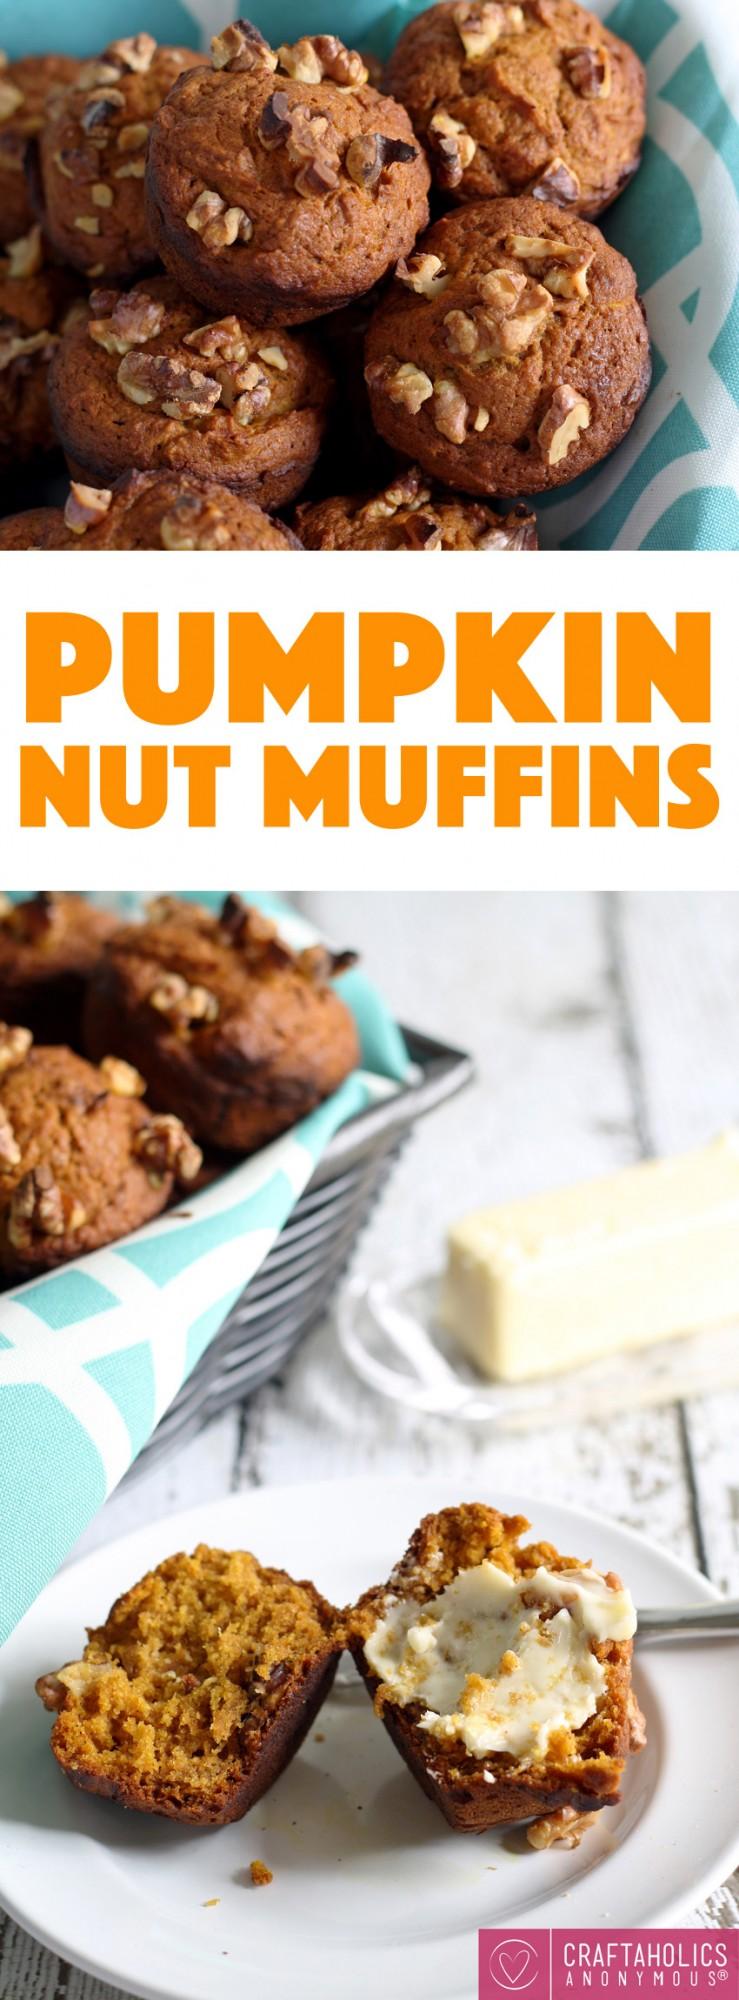 Pumpkin Nut Muffin